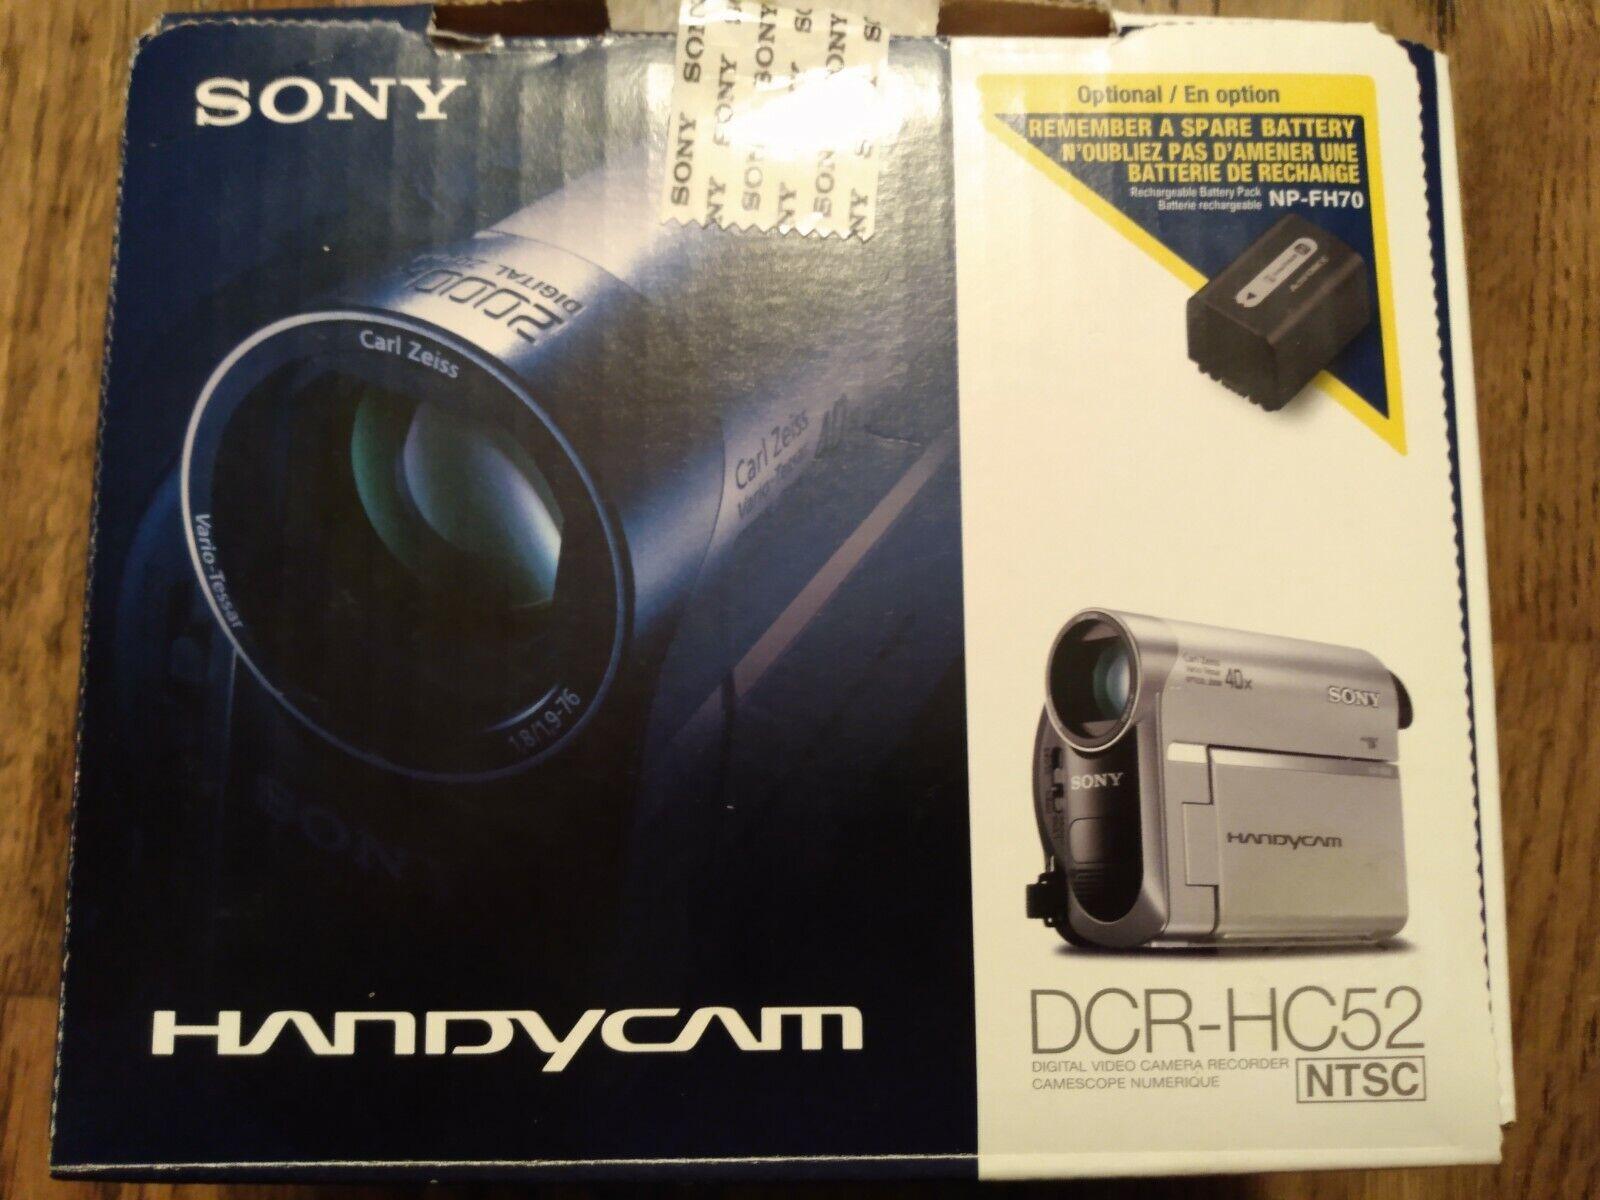 Sony DCR-HC52 2000x Zoom Handycam Digital Video Camera Recorder Zeiss 40x Zoom - $99.00